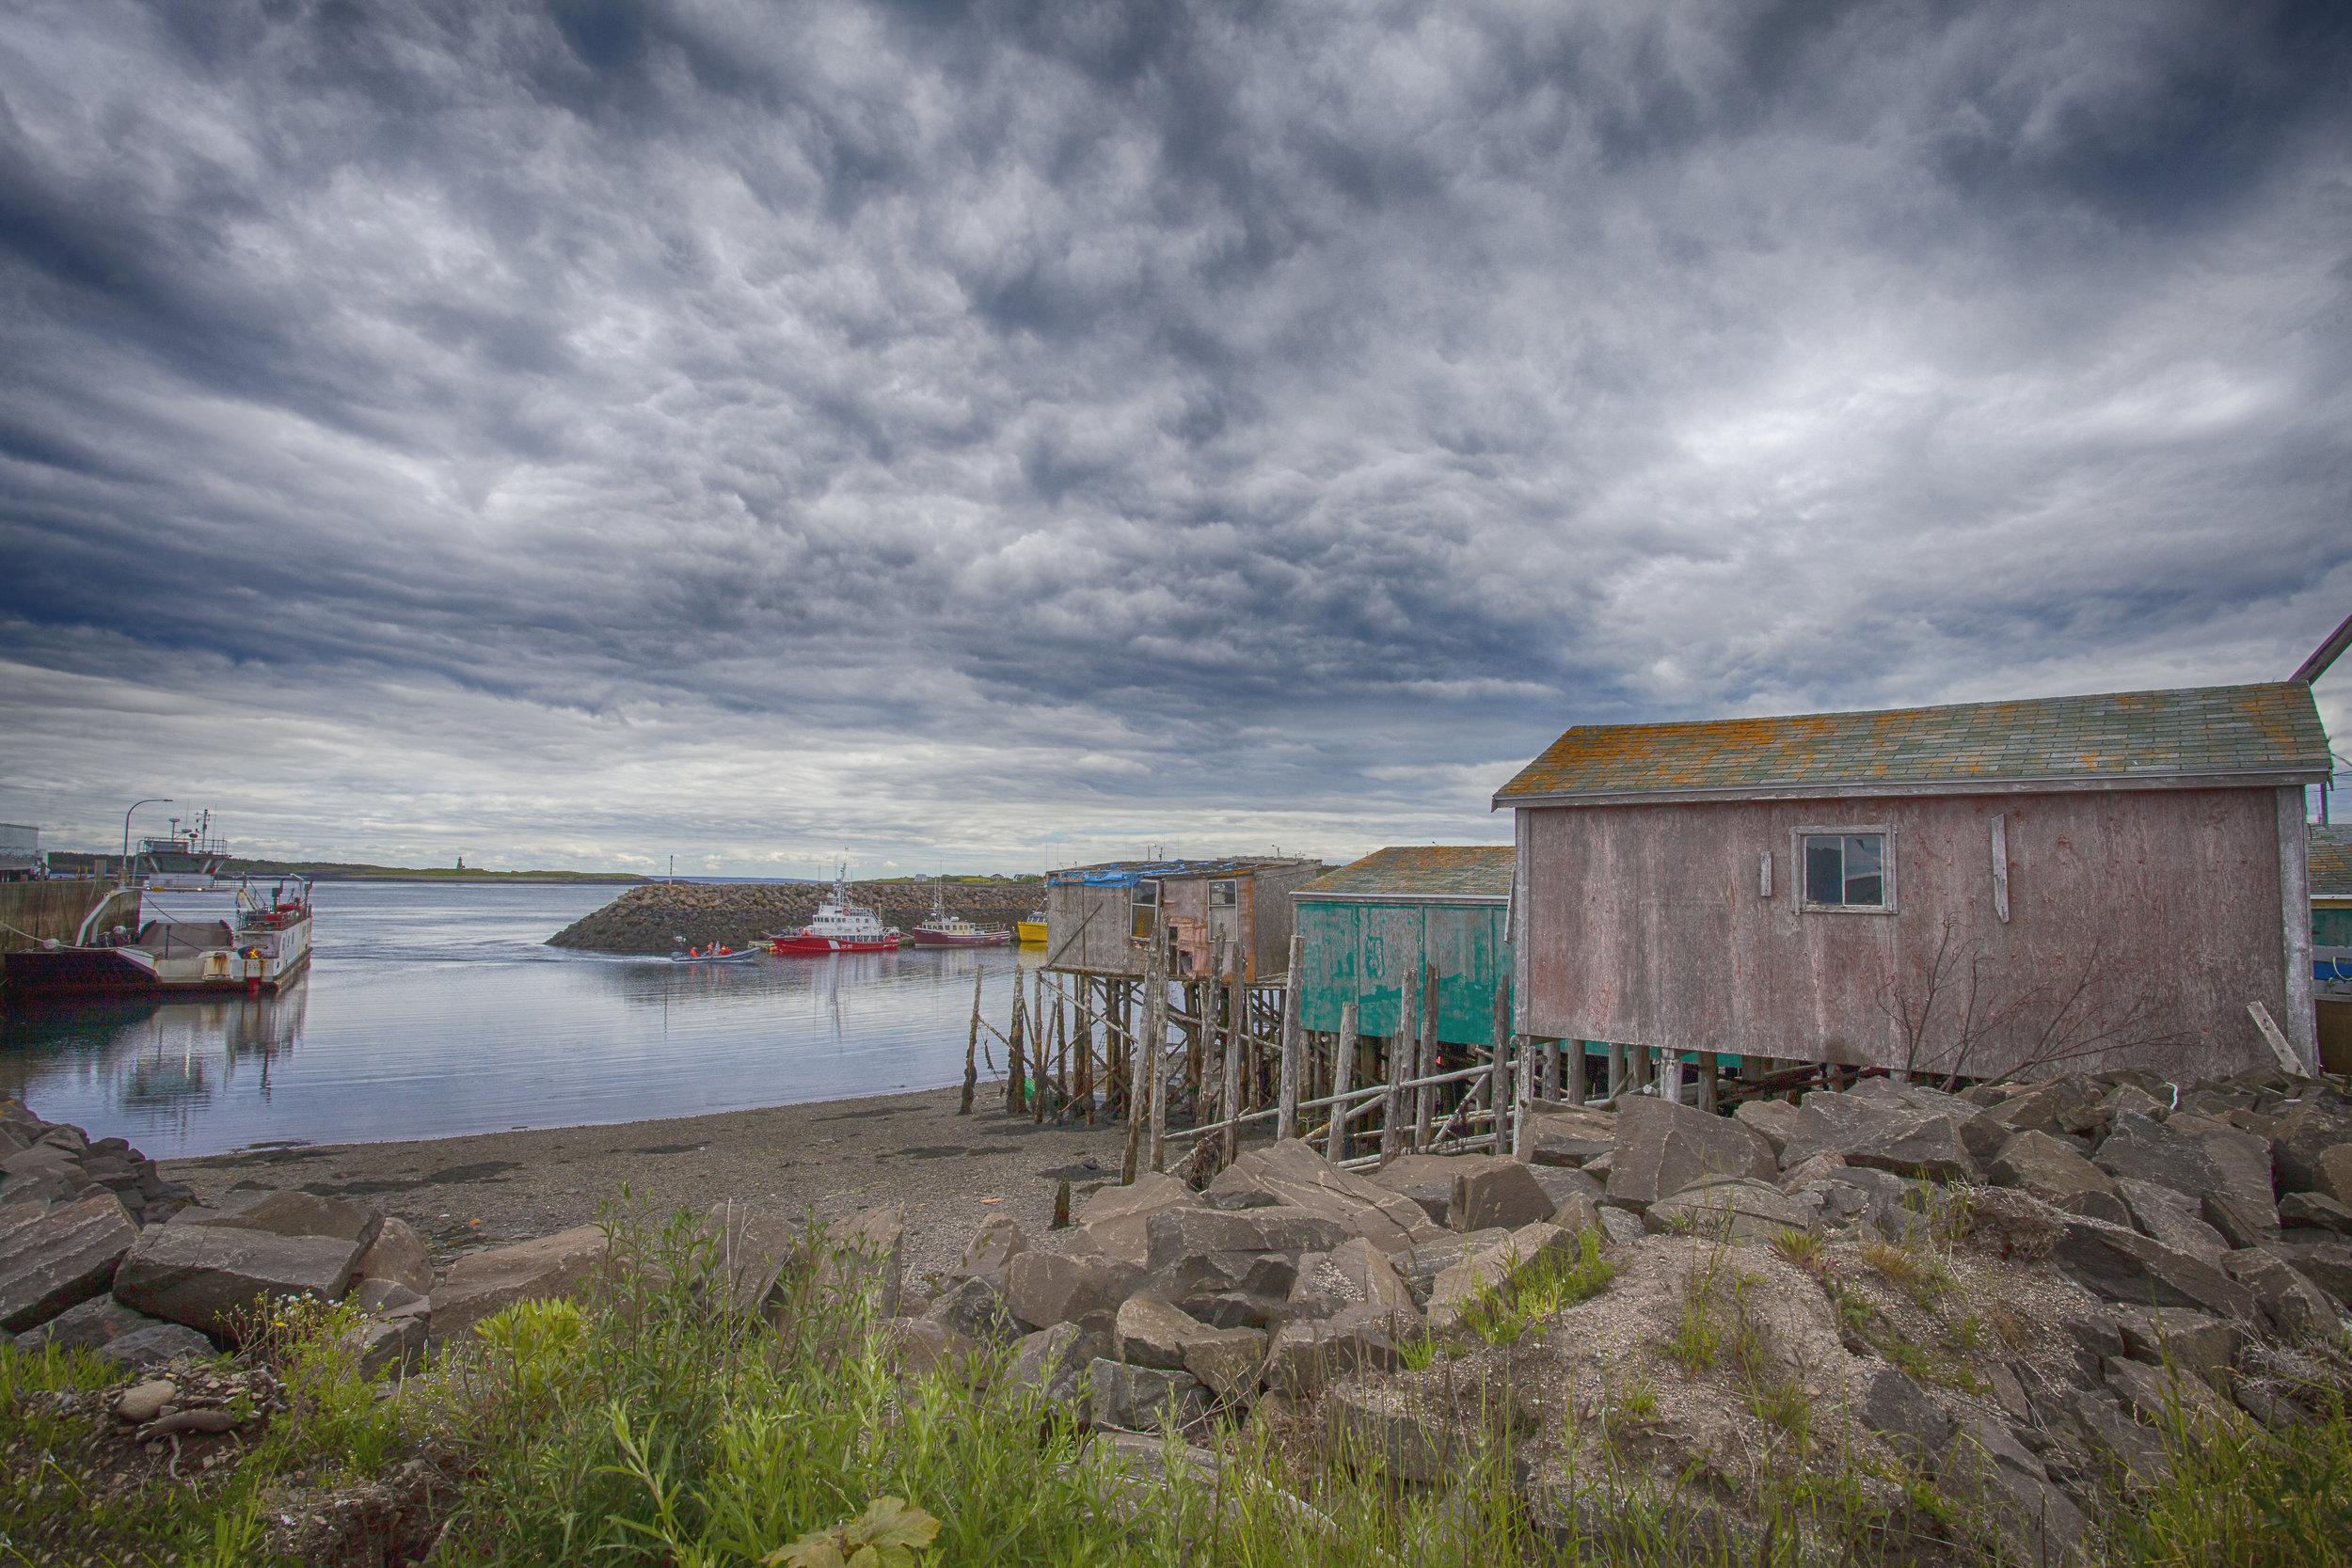 Fishing Village - Across the Blue Planet